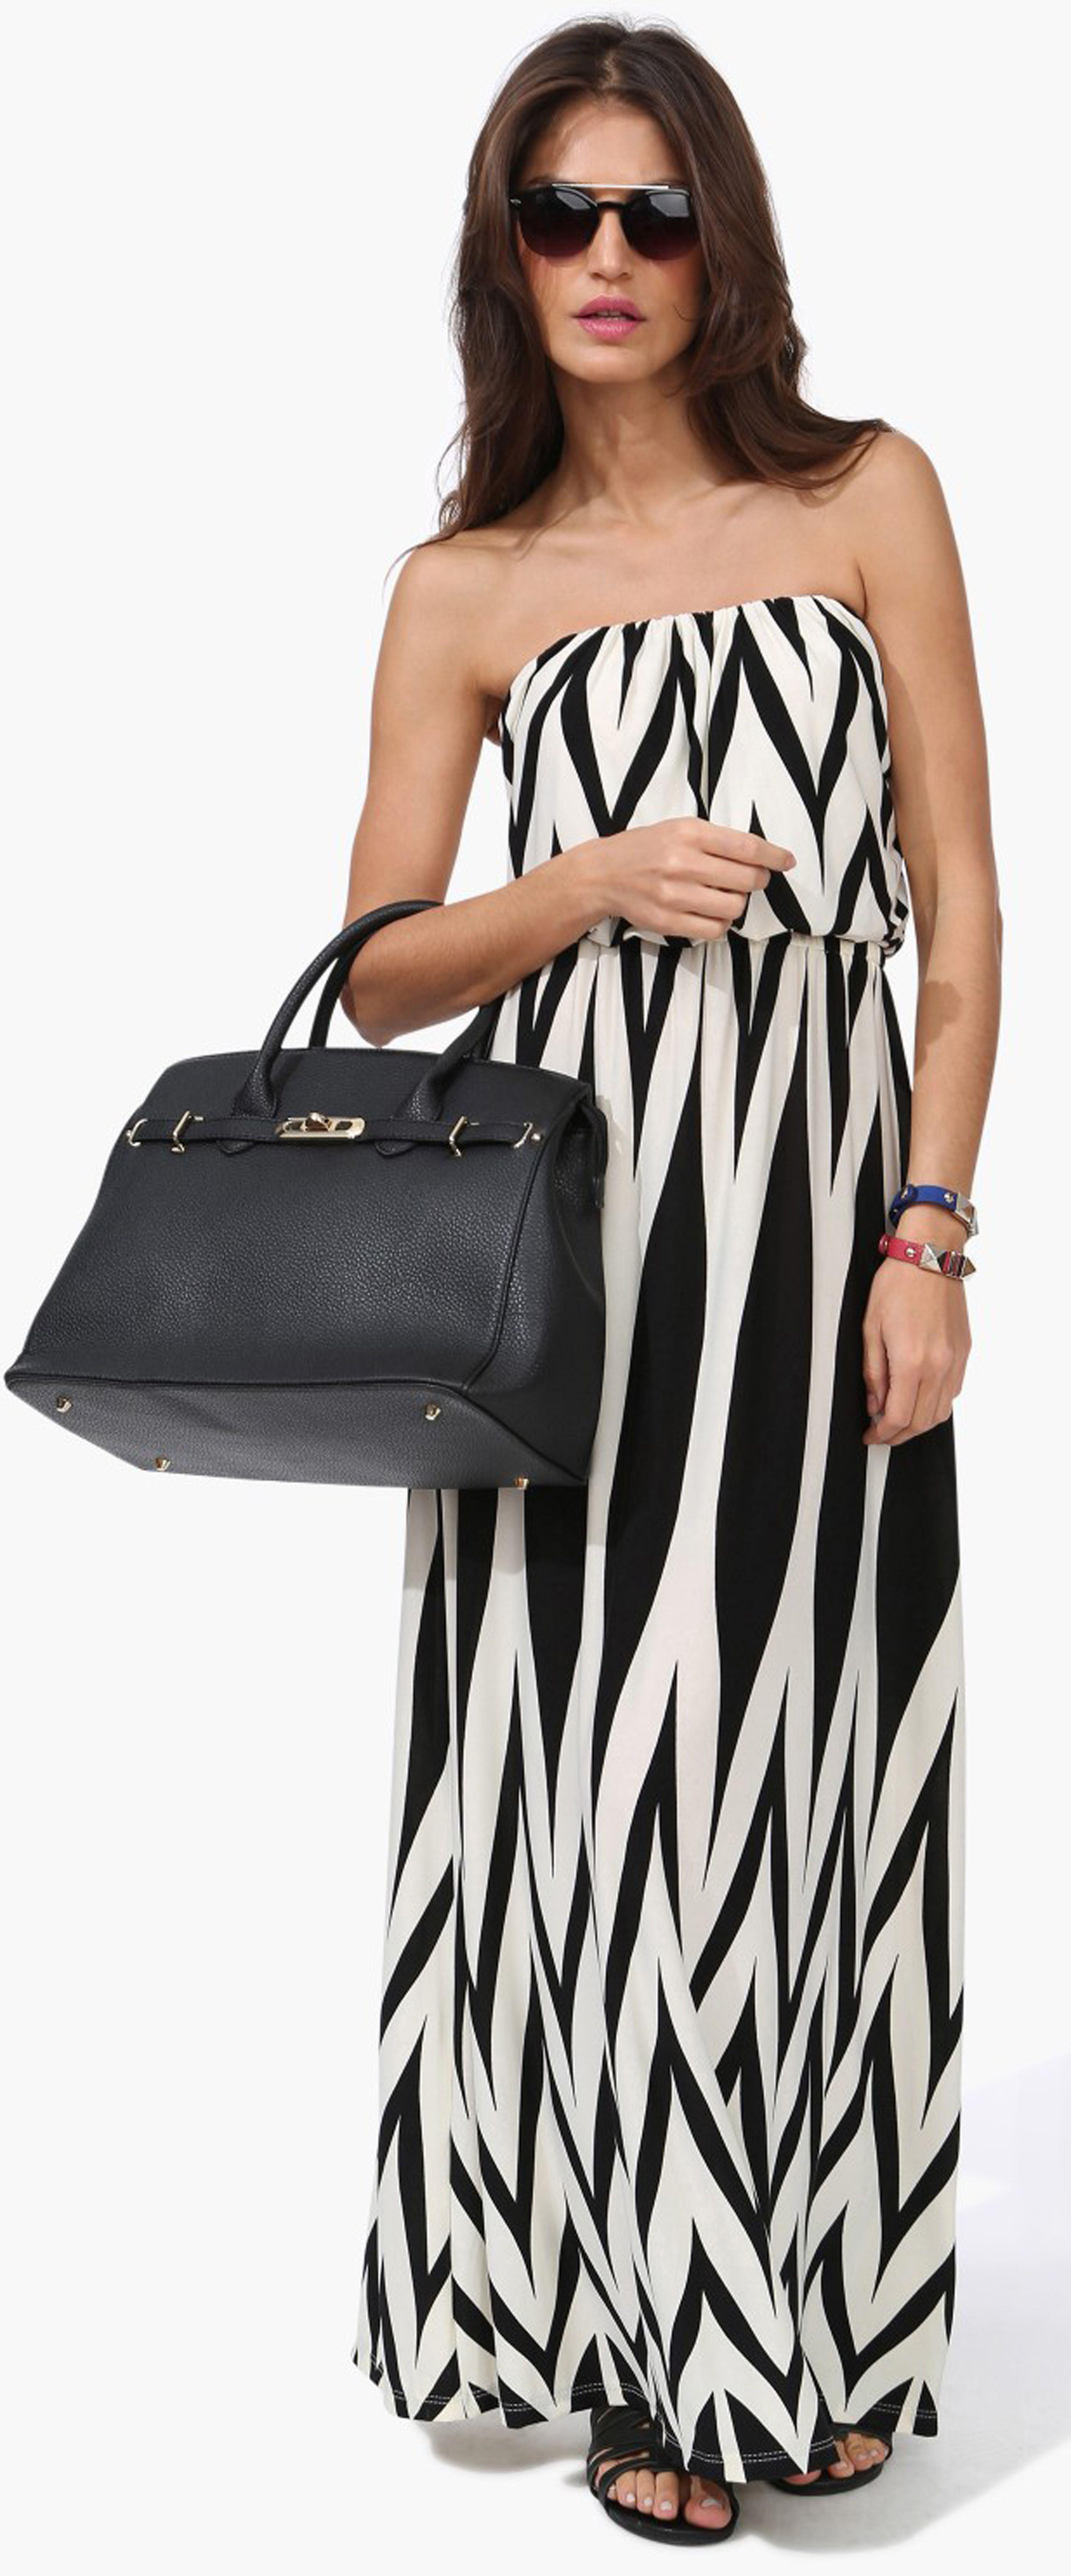 Black and white chevron strapless maxi dress